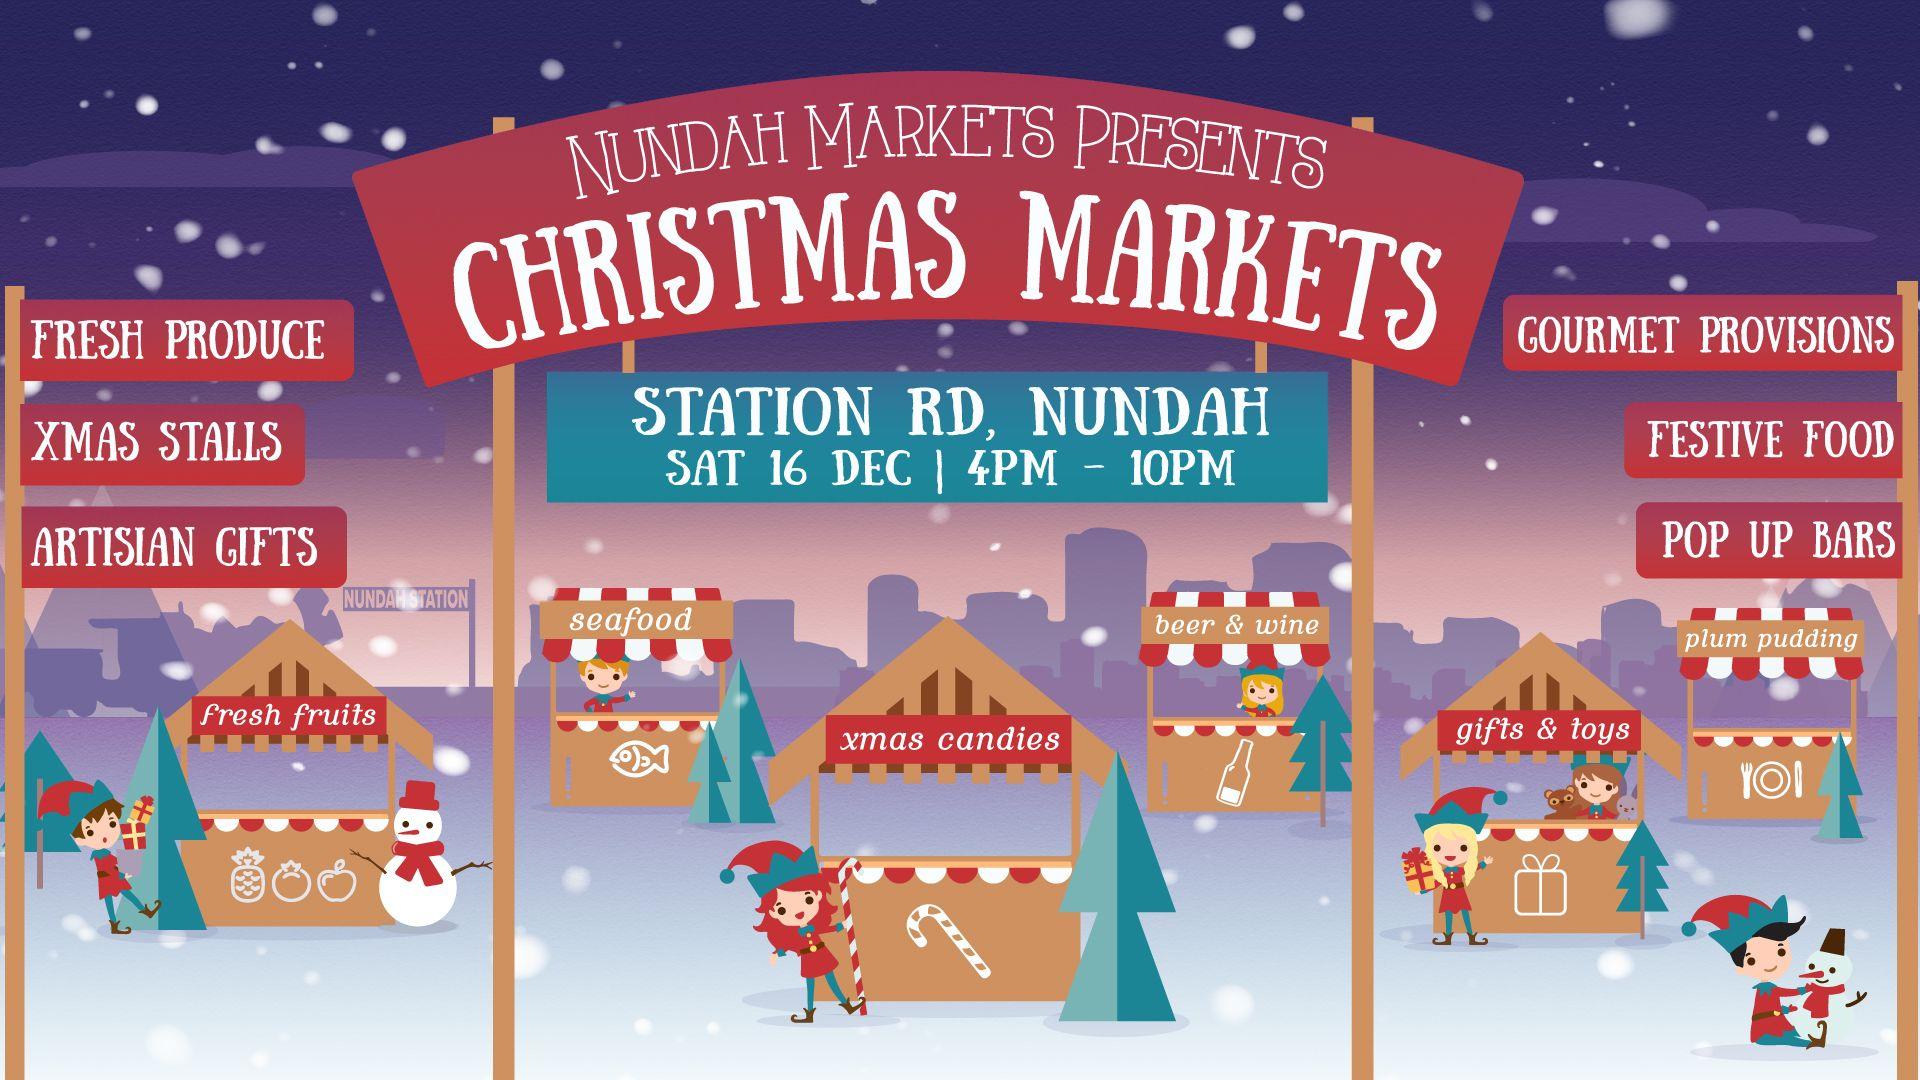 Nundah Markets Christmas Markets Banner (Christmas 2017)